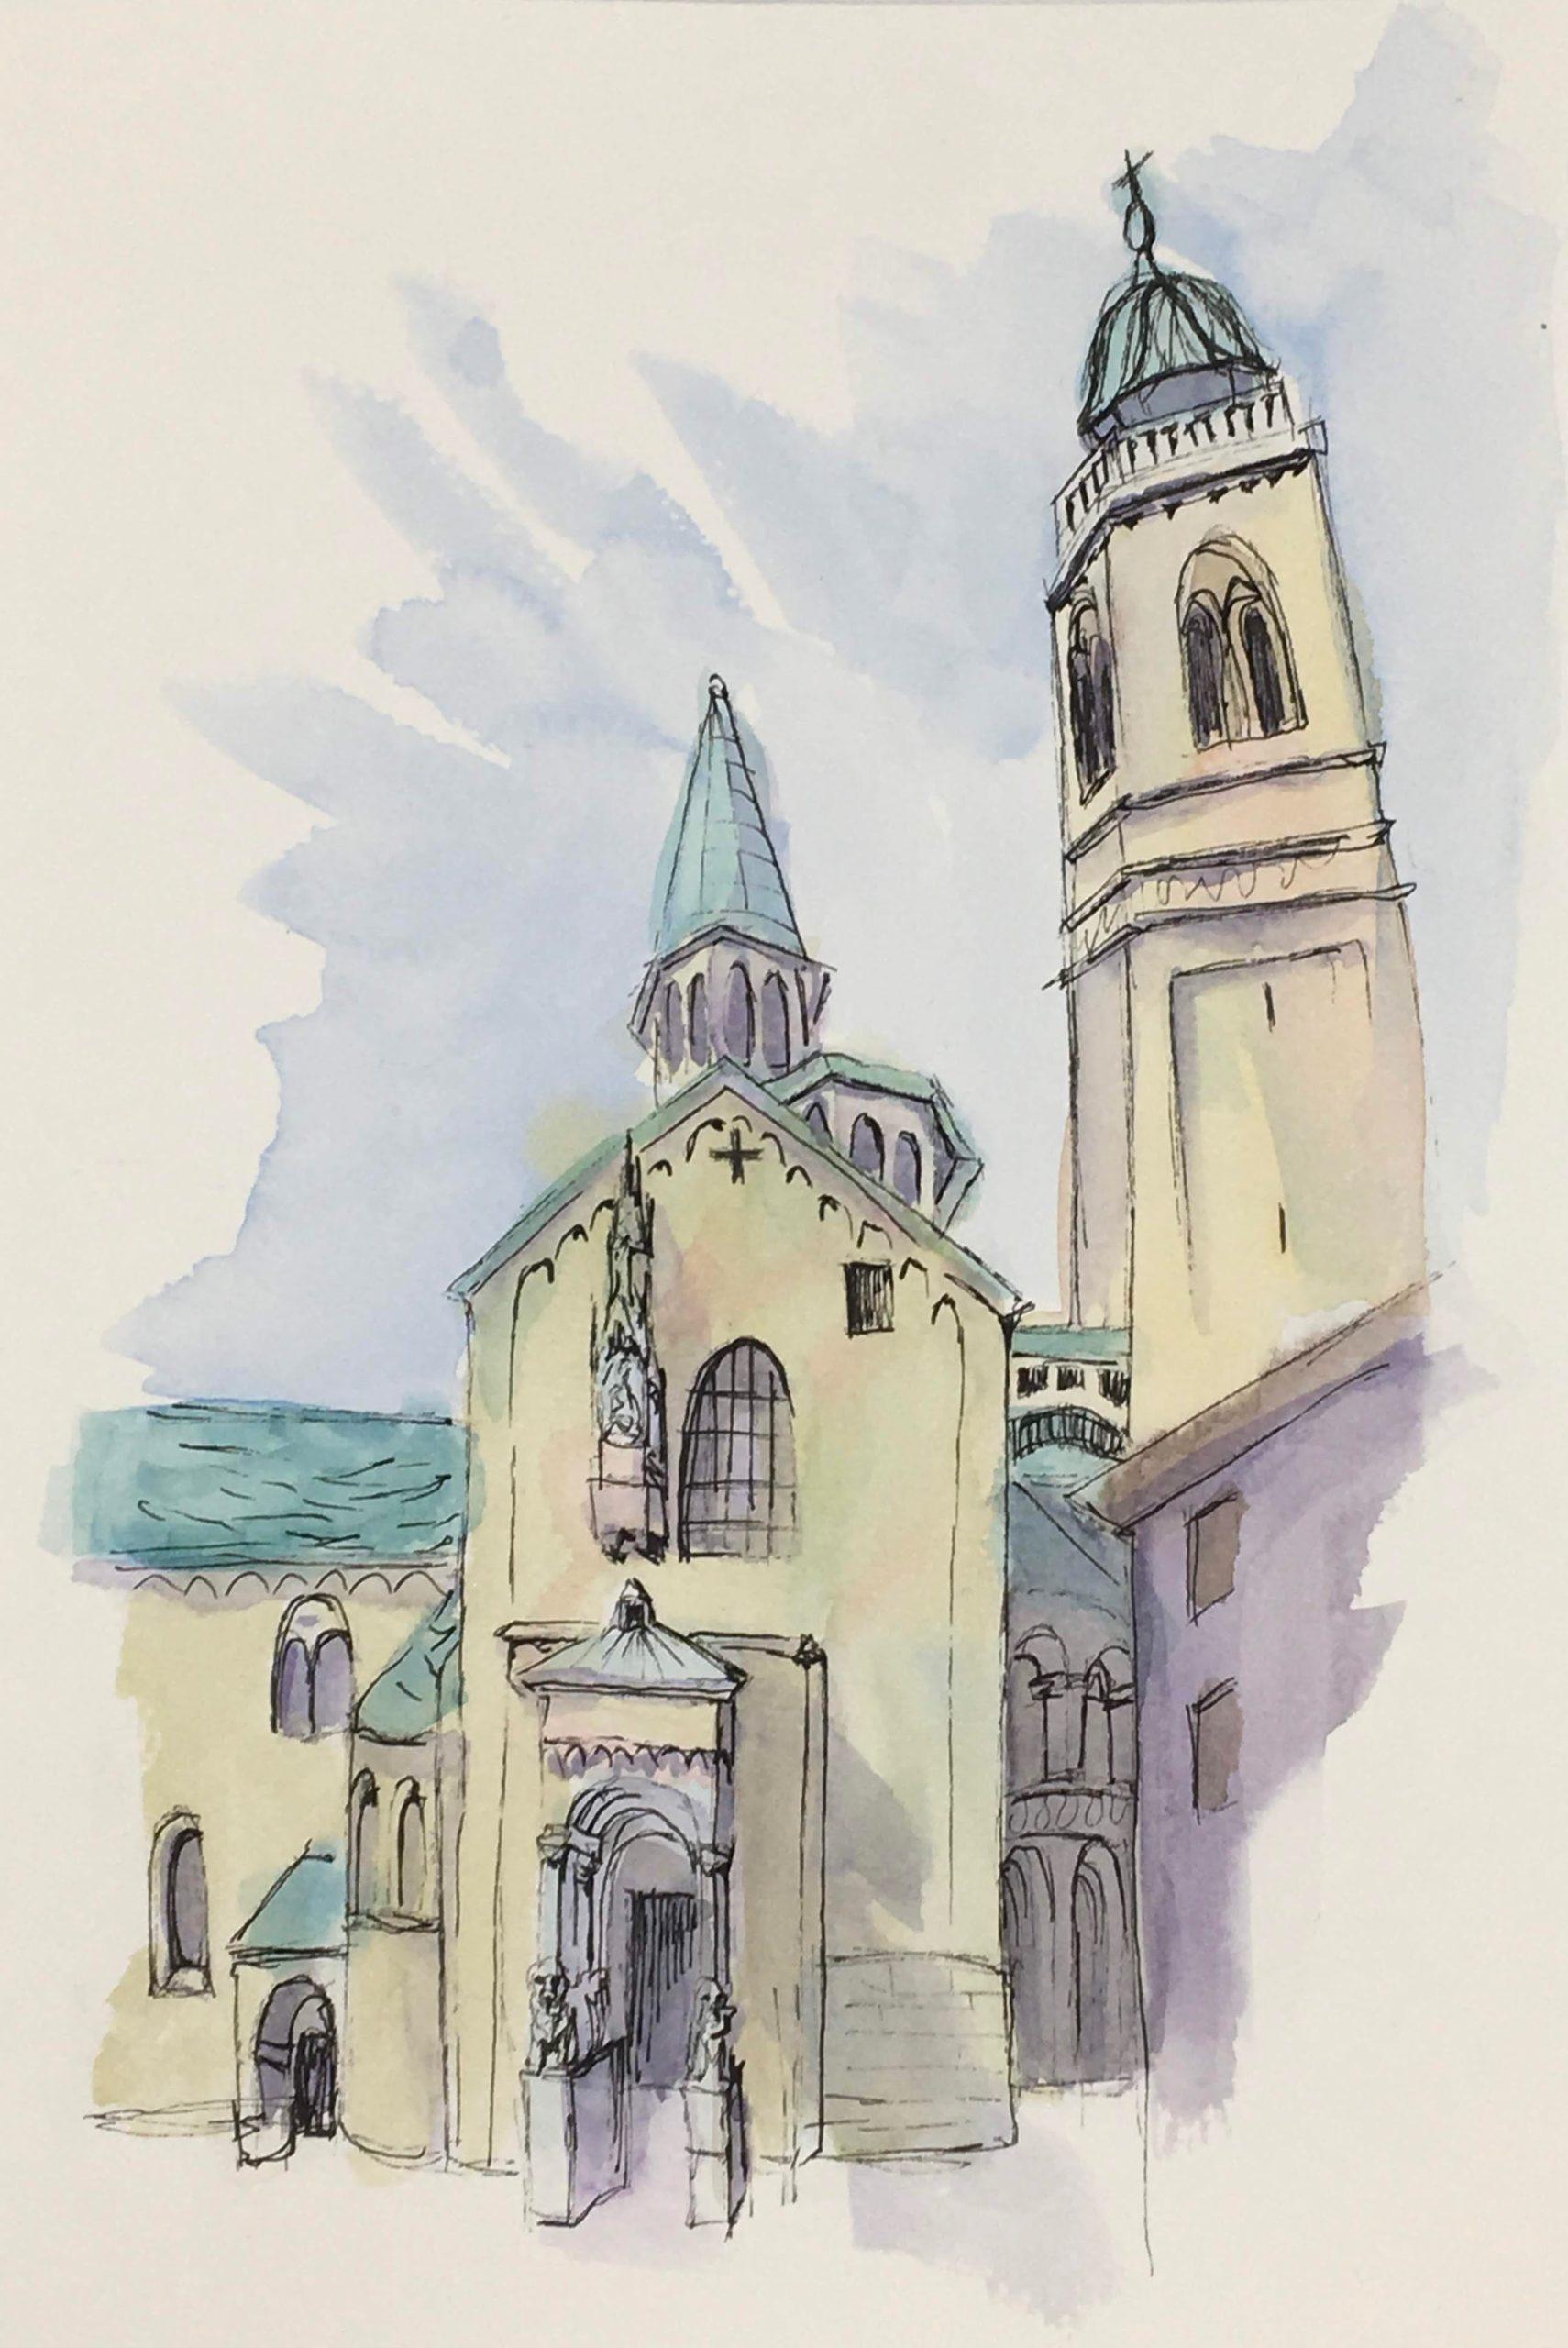 Painting of the Church of Santa Annunziata in Bergamo